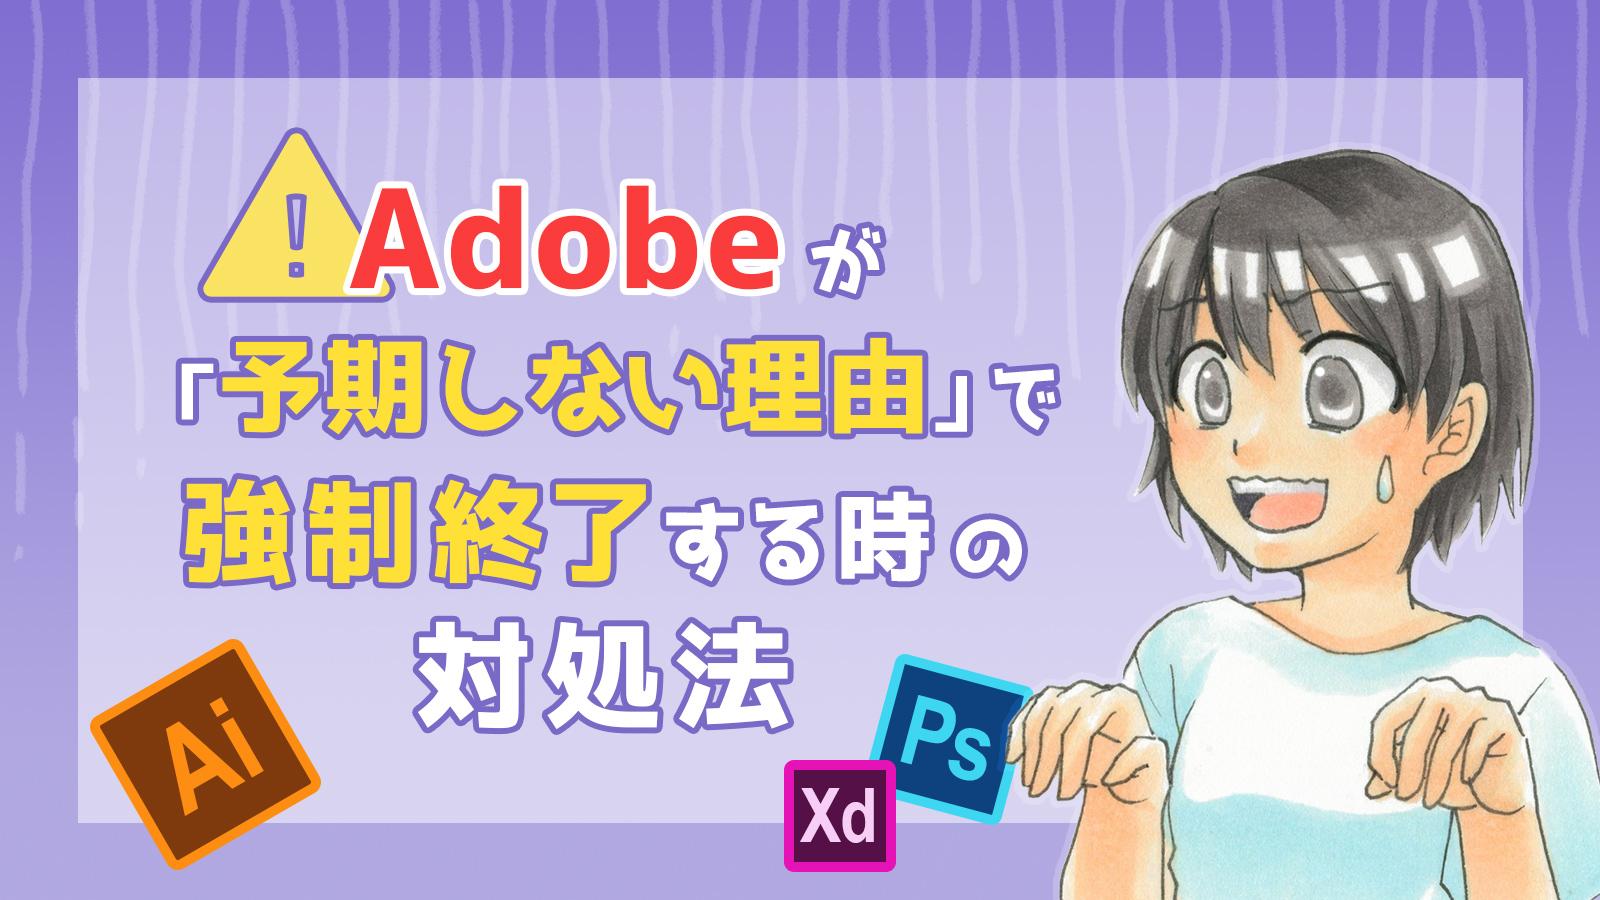 Adobeが「予期しない理由」で落ちまくる時に試してみた対処法